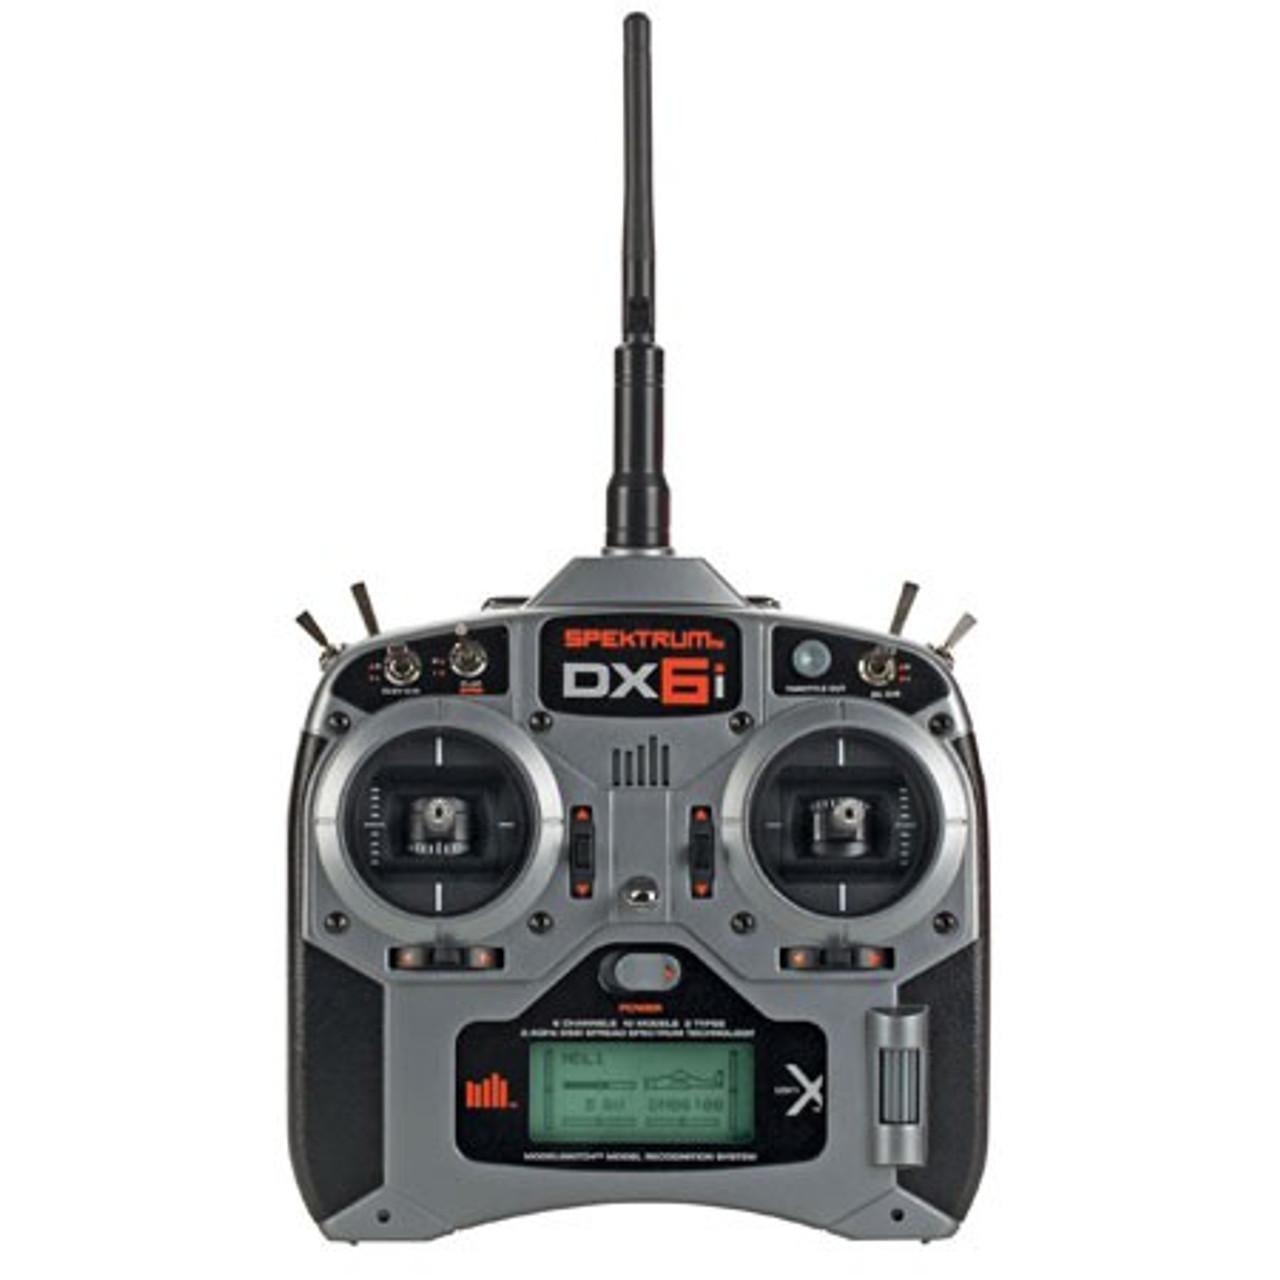 Spektrum DX6i Transmitter Mode 1 w/ AR610 Receiver